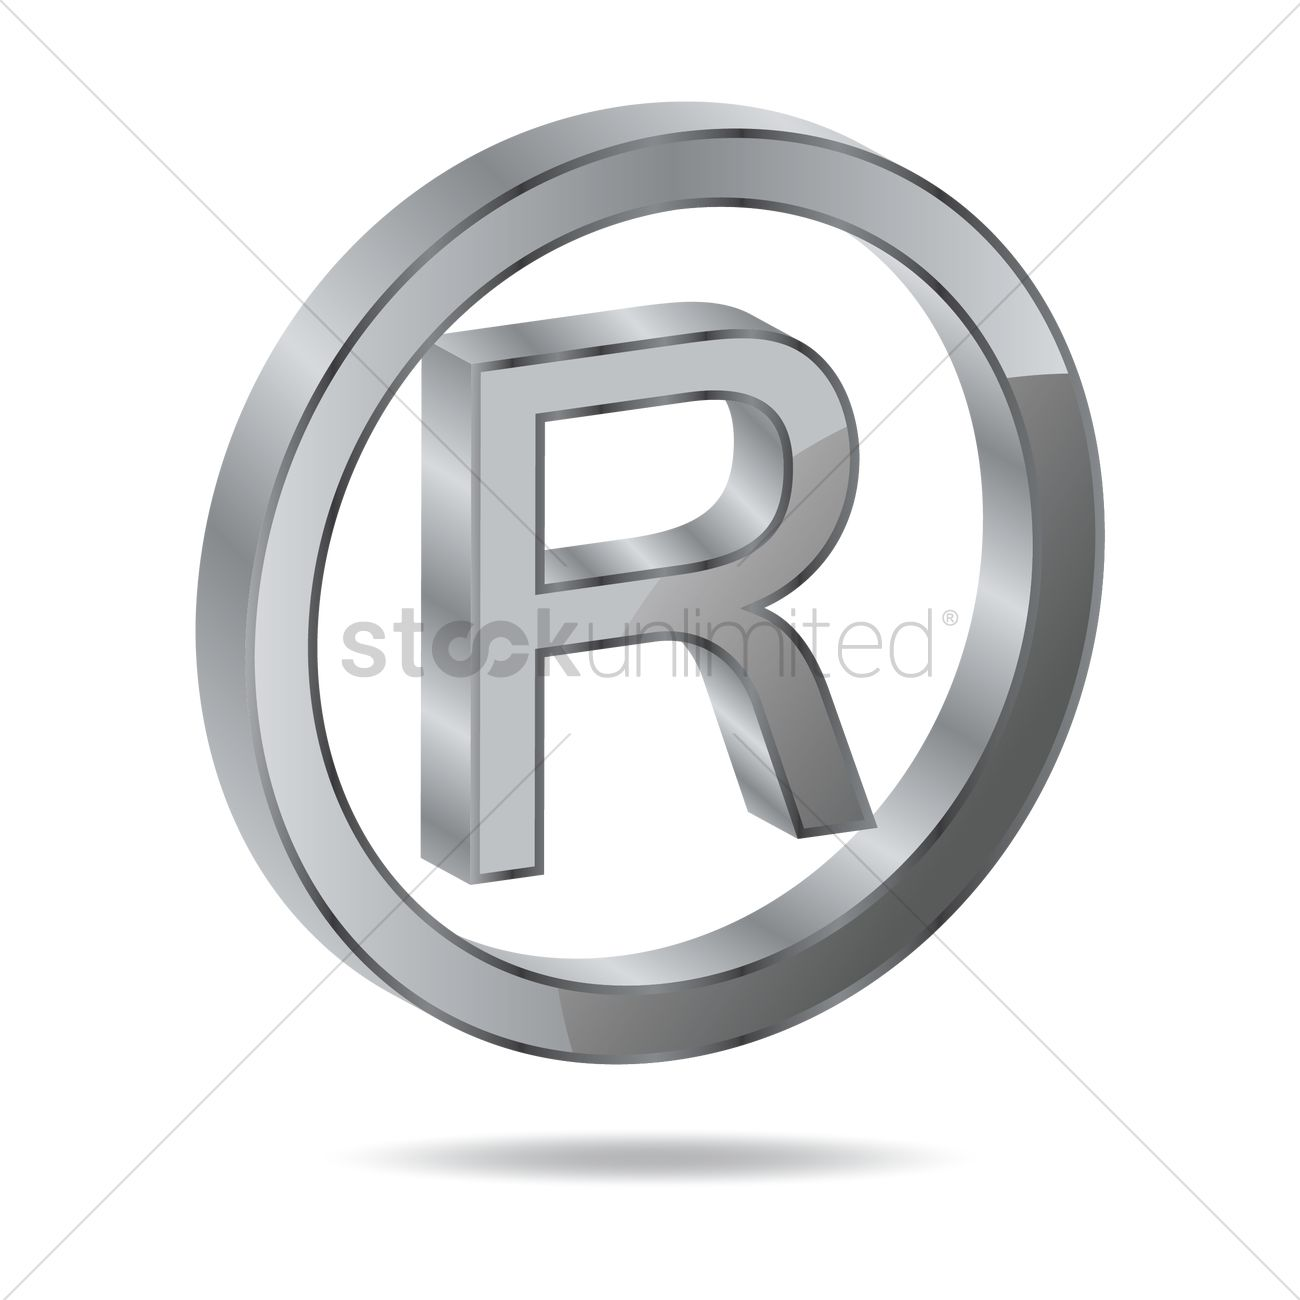 Registered Trademark Symbol Vector Image 1631446 Stockunlimited